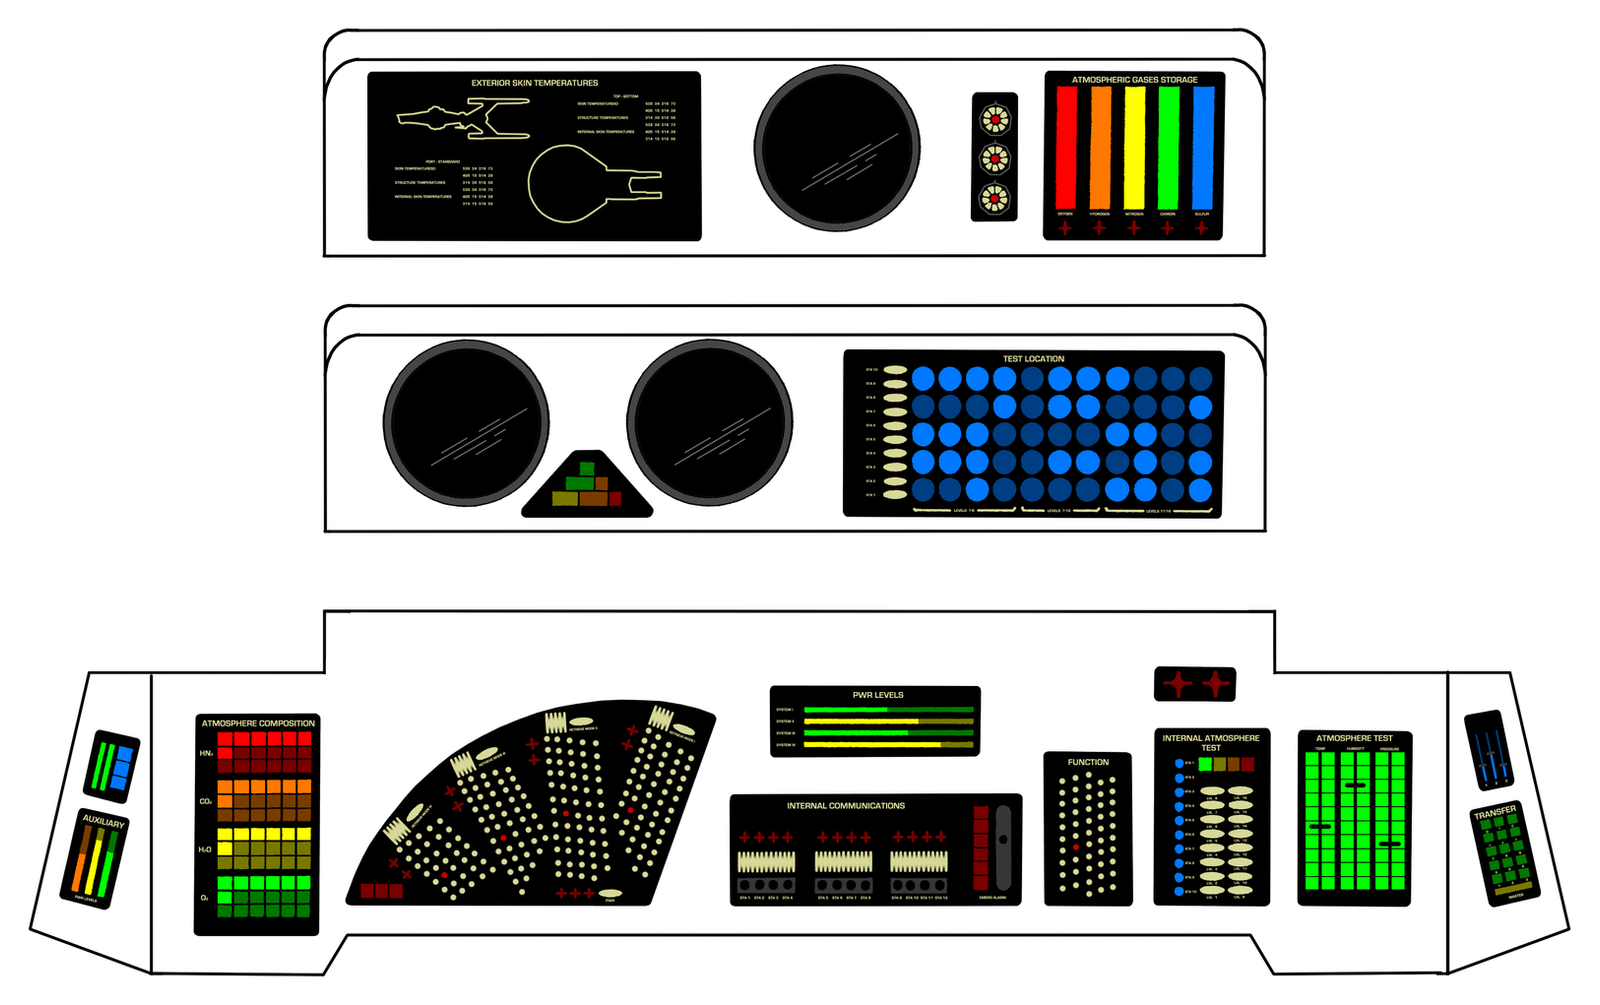 Operations console tmp ver by keiichi k1 on deviantart - Star trek online console ...